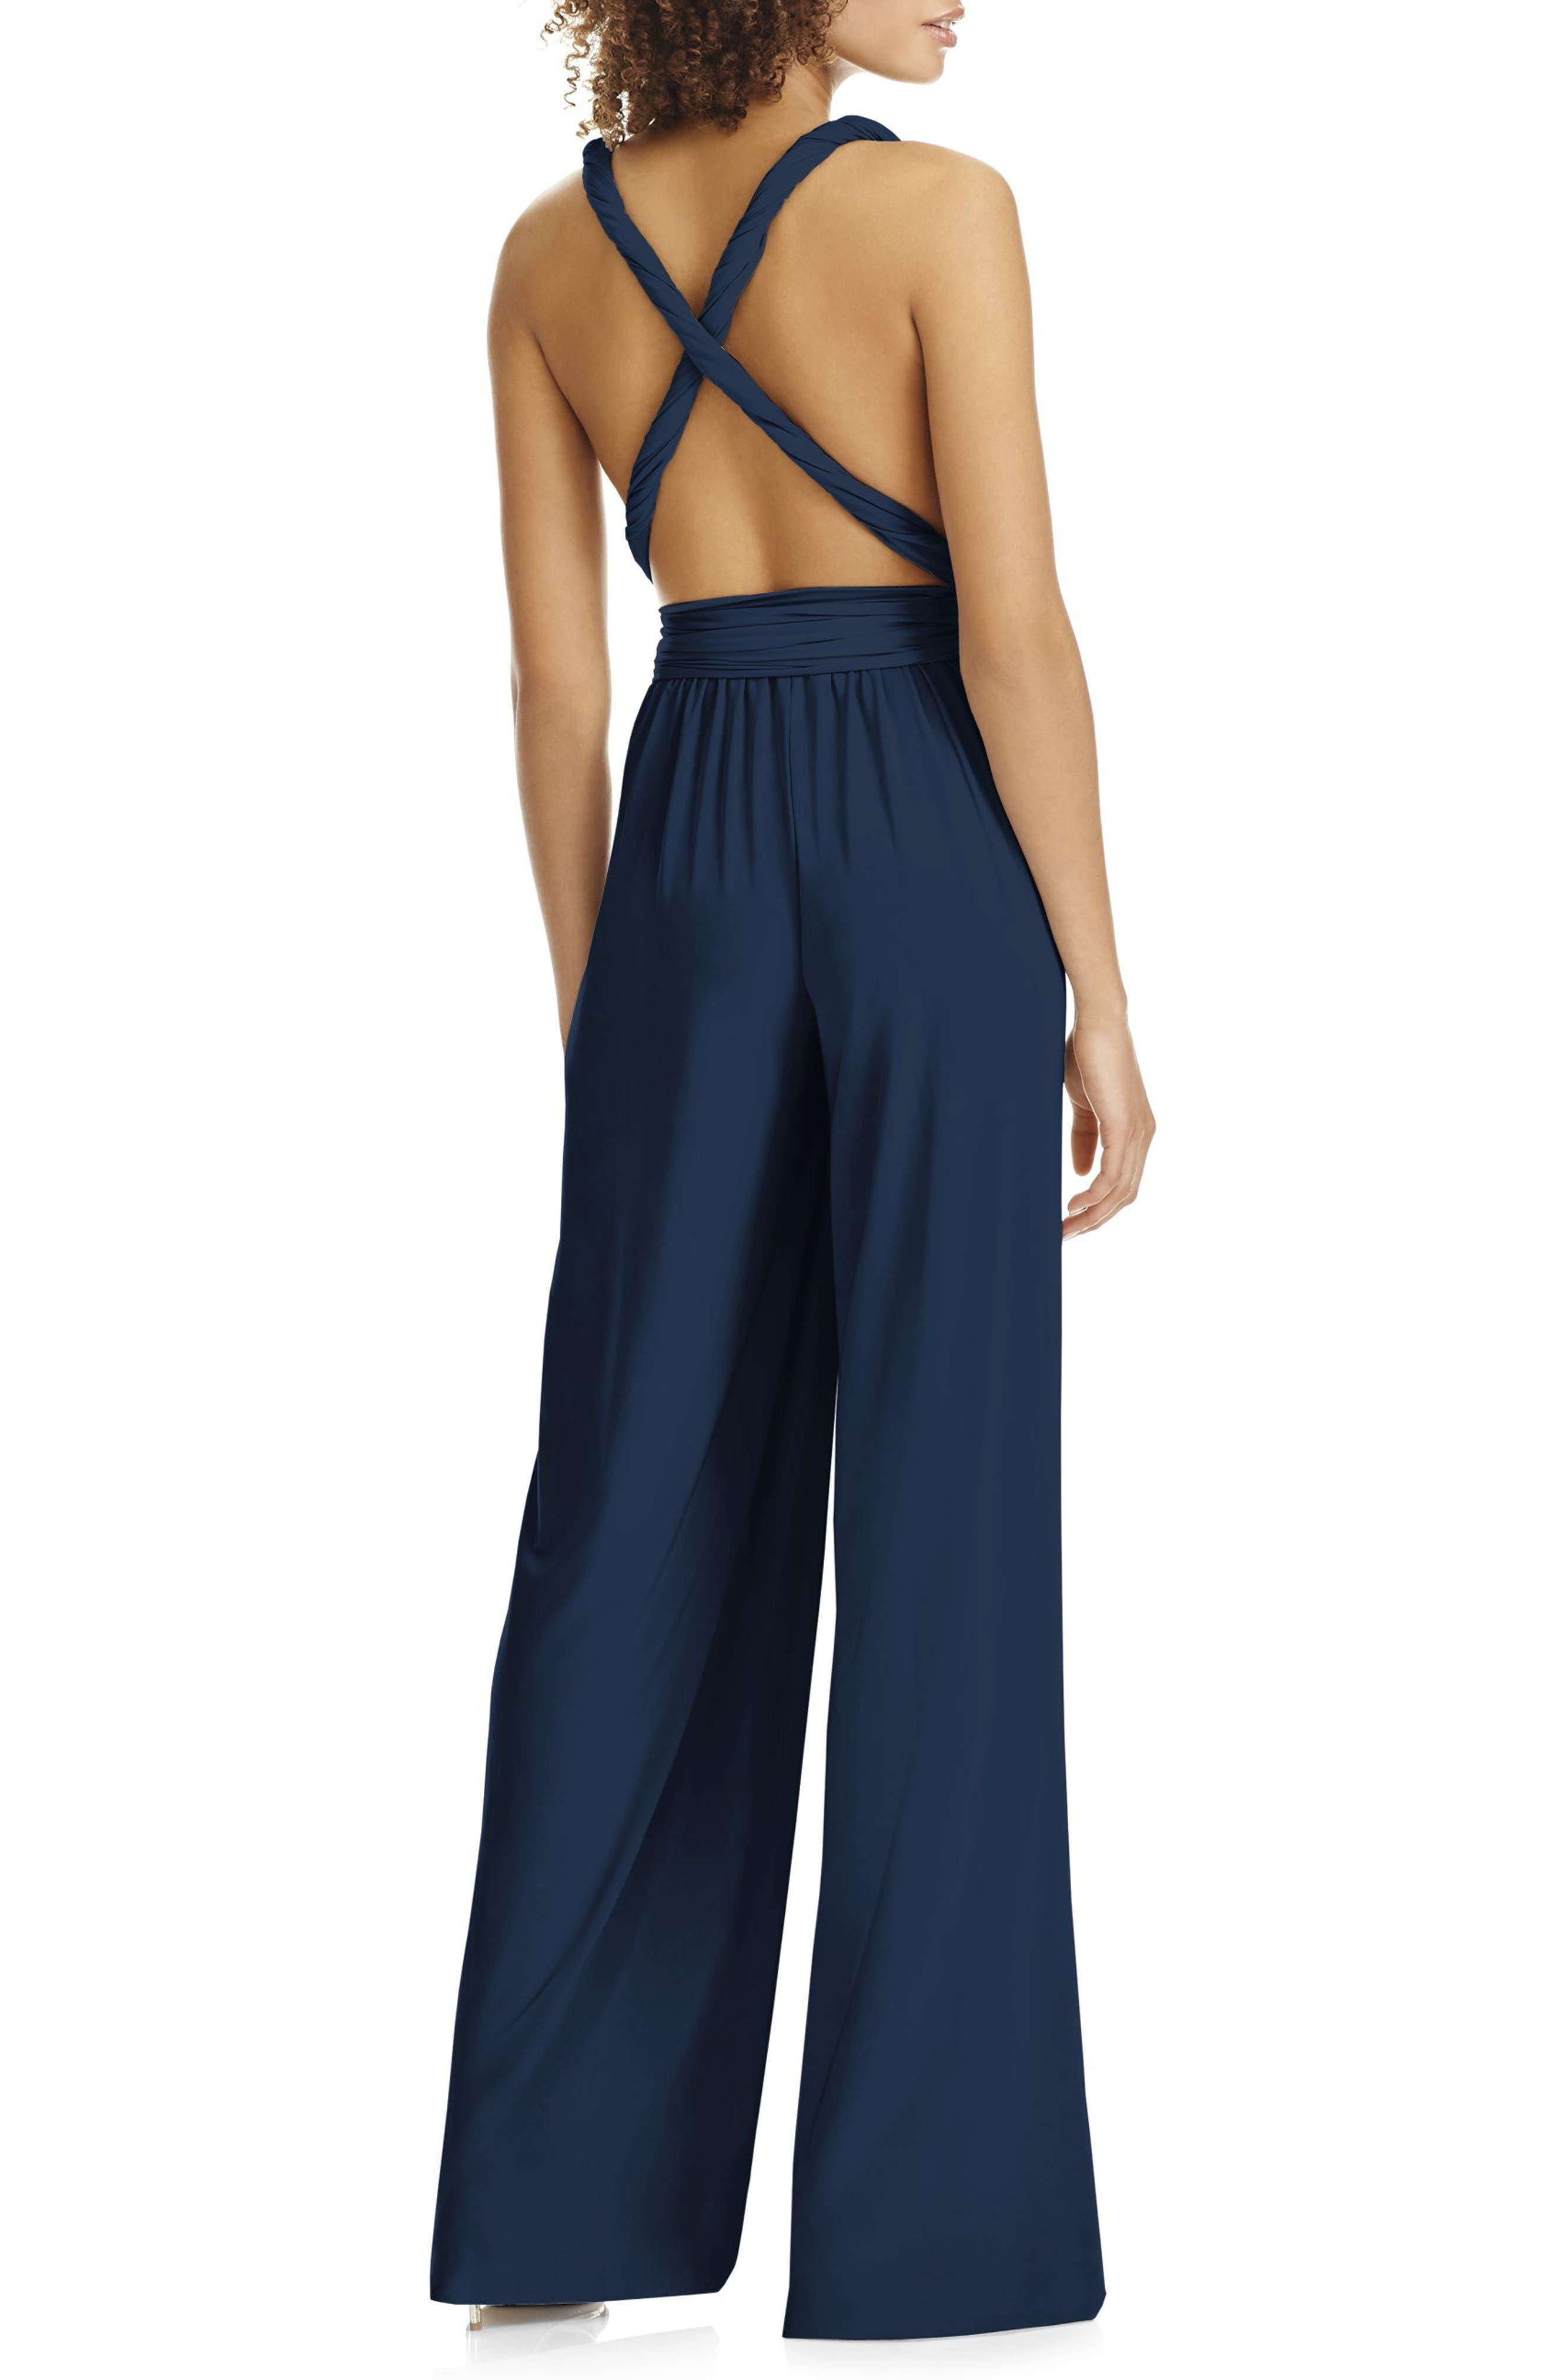 6c093b543776 Women's Jersey Knit Formal Dresses | Nordstrom